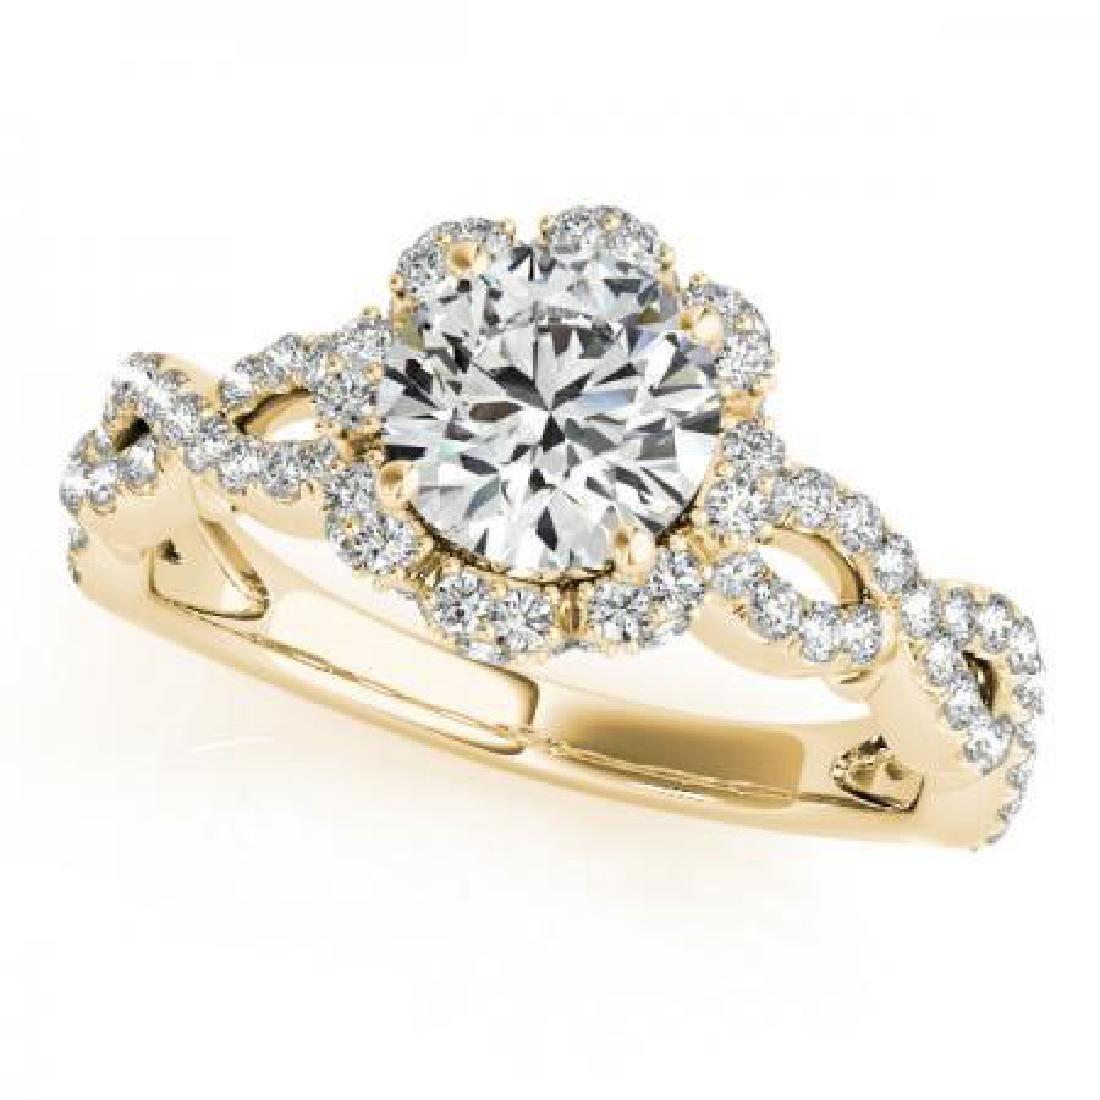 CERTIFIED 18K YELLOW GOLD 1.00 CT G-H/VS-SI1 DIAMOND HA